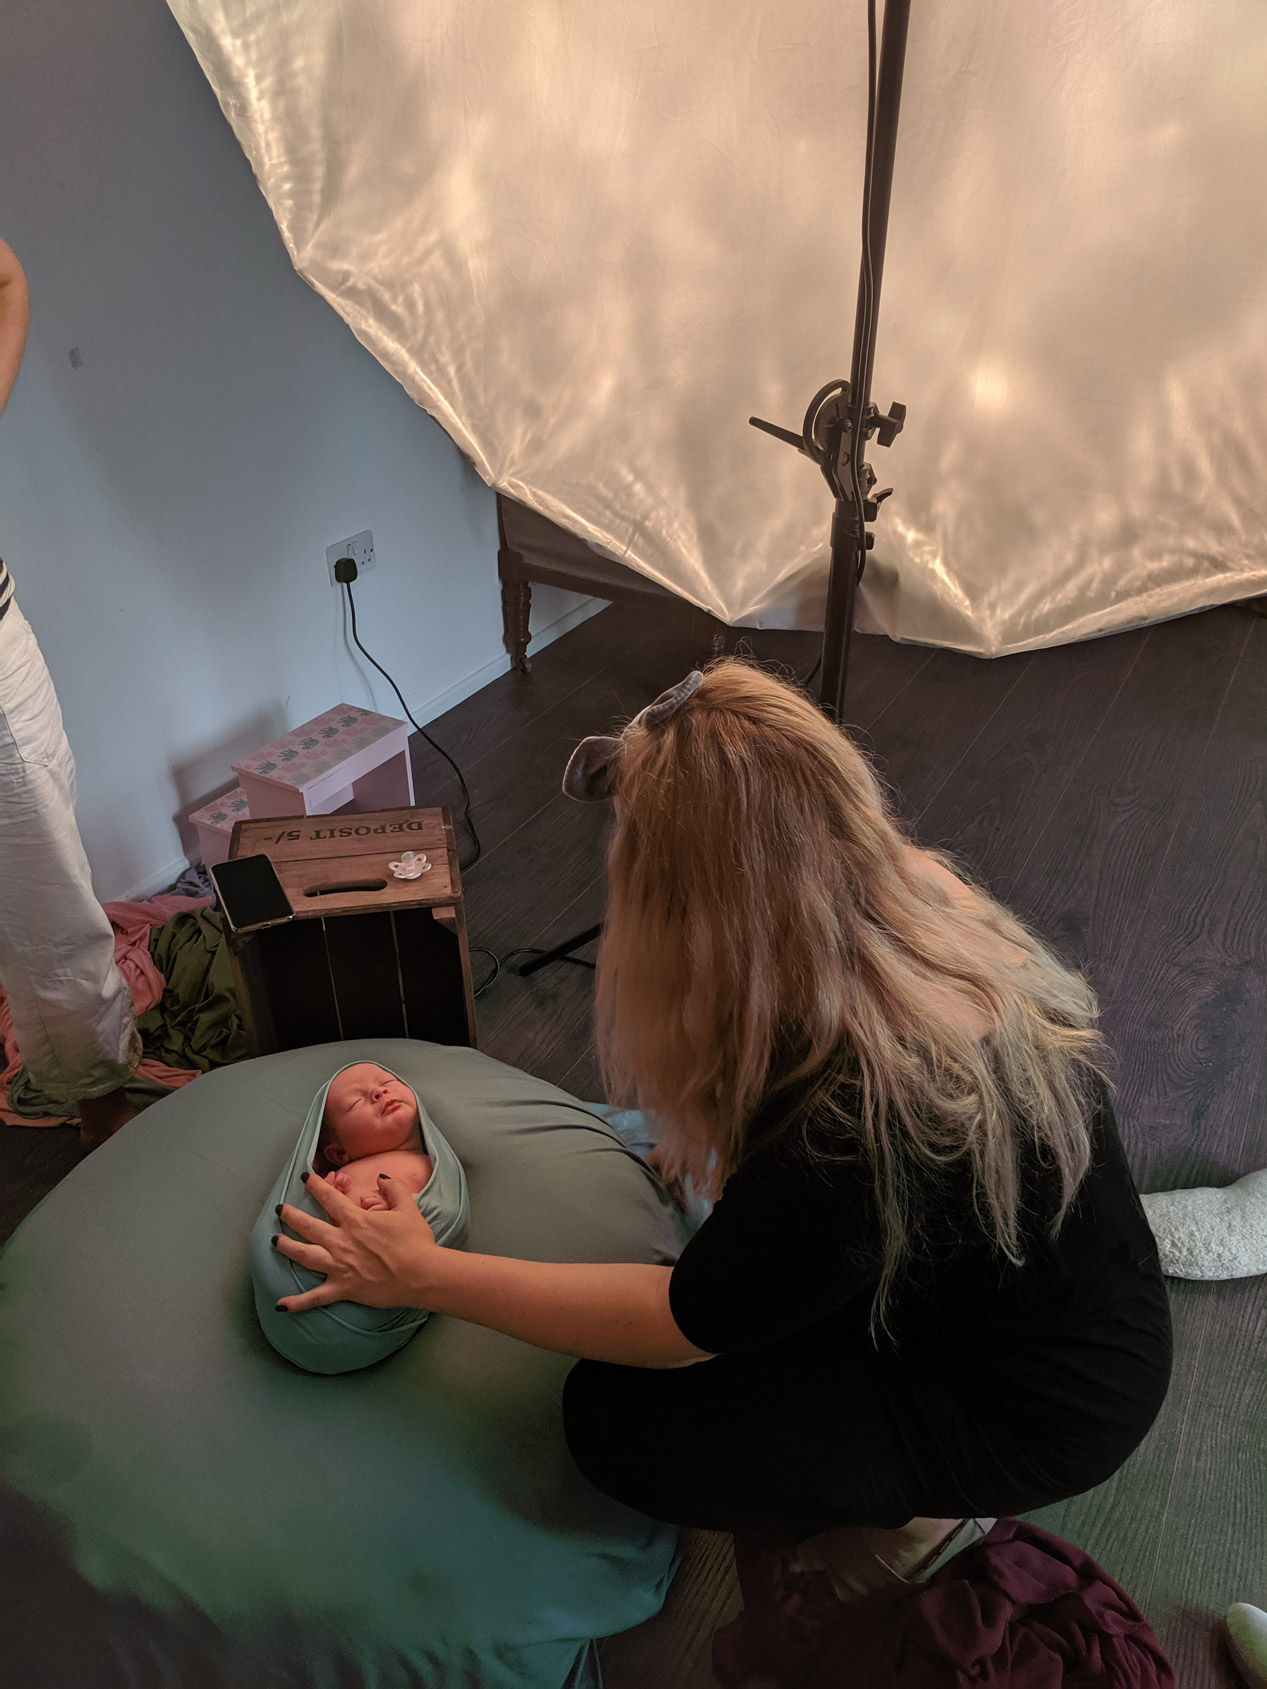 newborn-photography-hemel-hempstead-professional-studio2.jpg